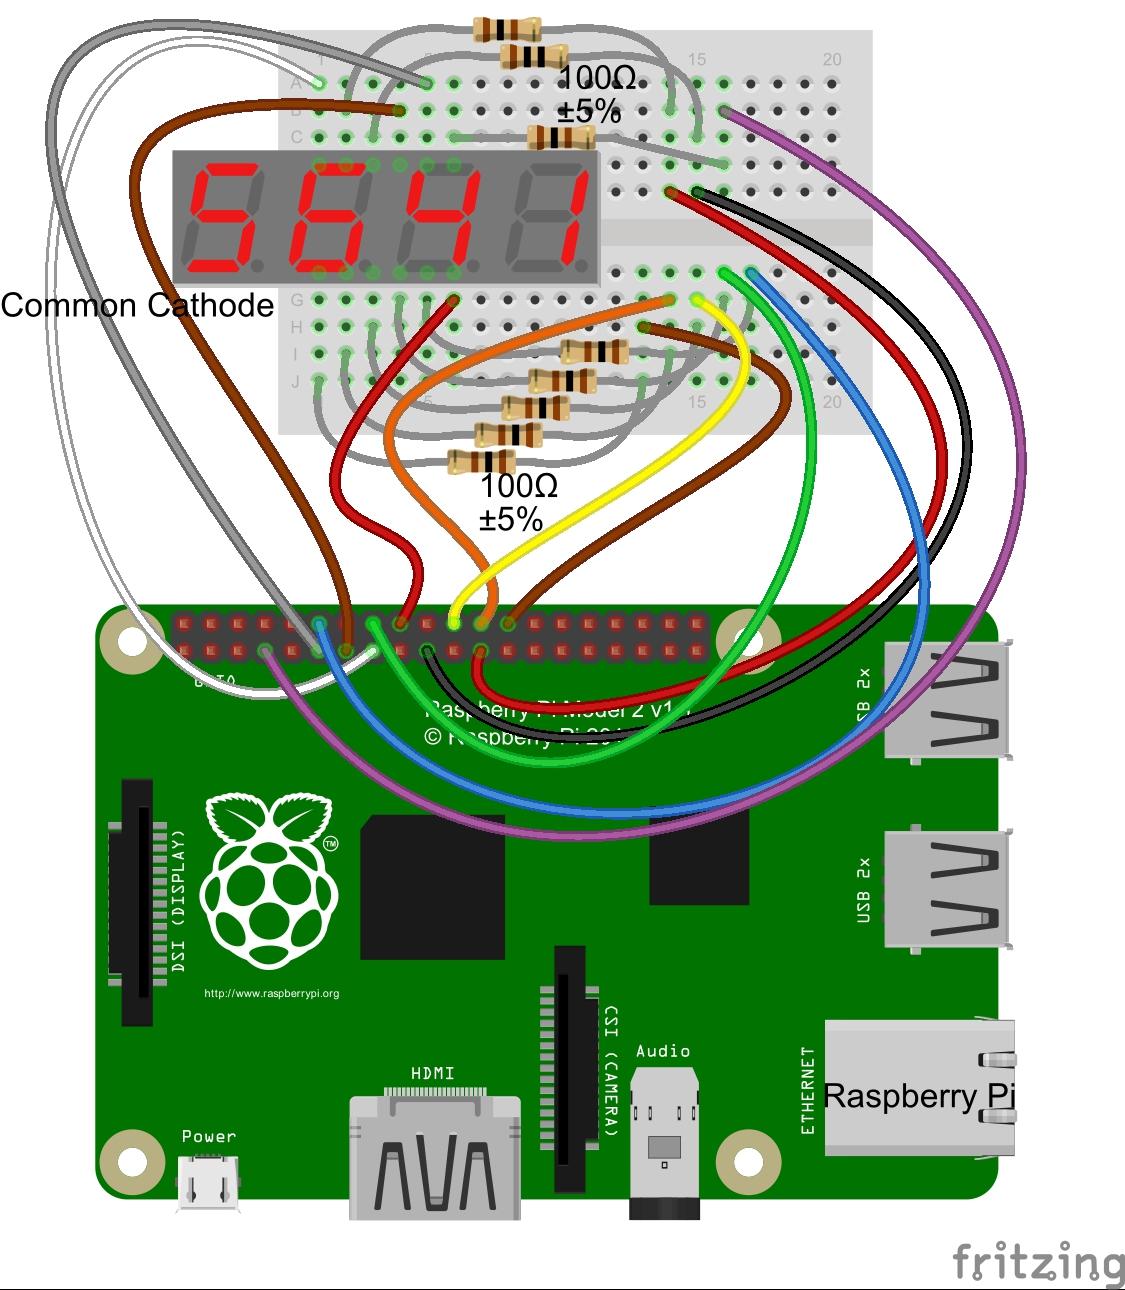 Seven Segment Pin Diagram Gm 7 Way Trailer Plug Wiring Sparks N Smoke 70 The 4 Digit Led Display